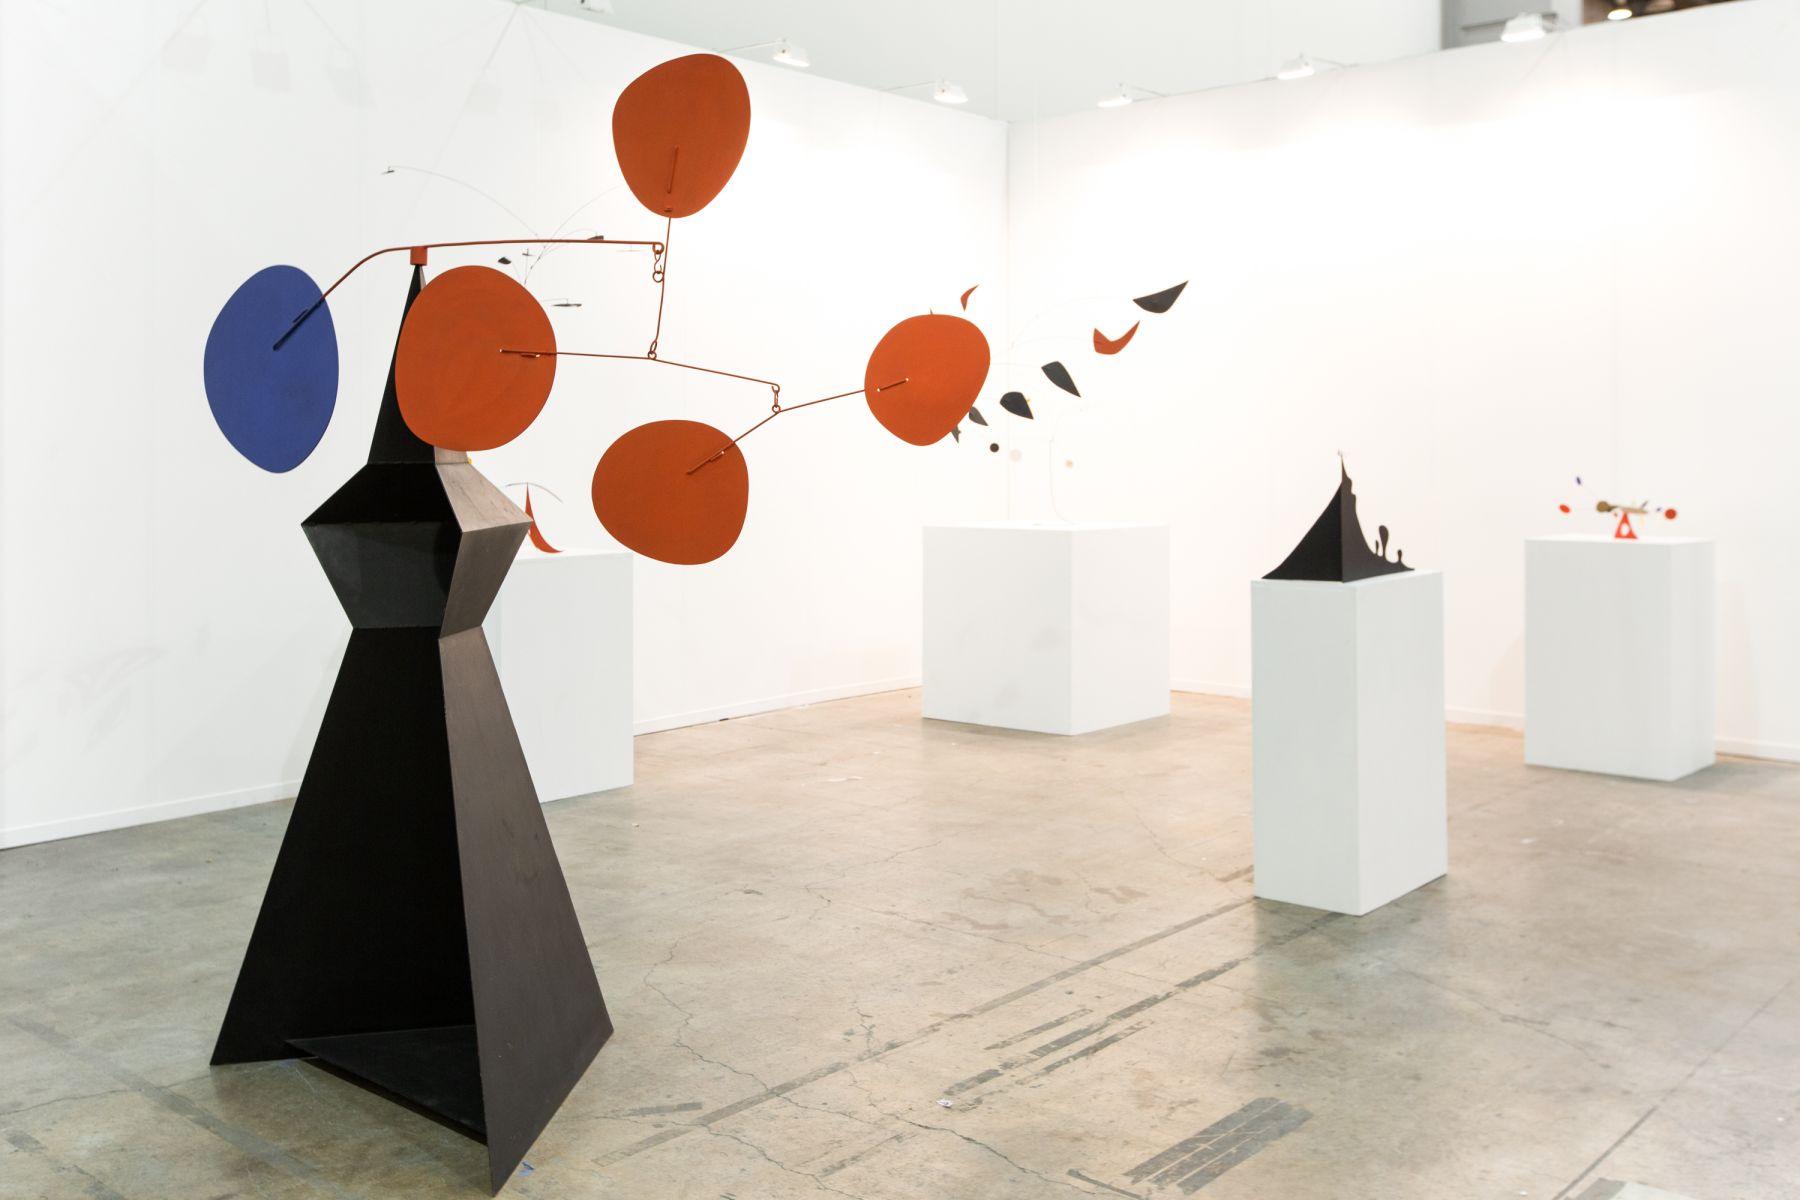 Installation view of Alexander Calder at Zona Maco, Mexico City, 2016